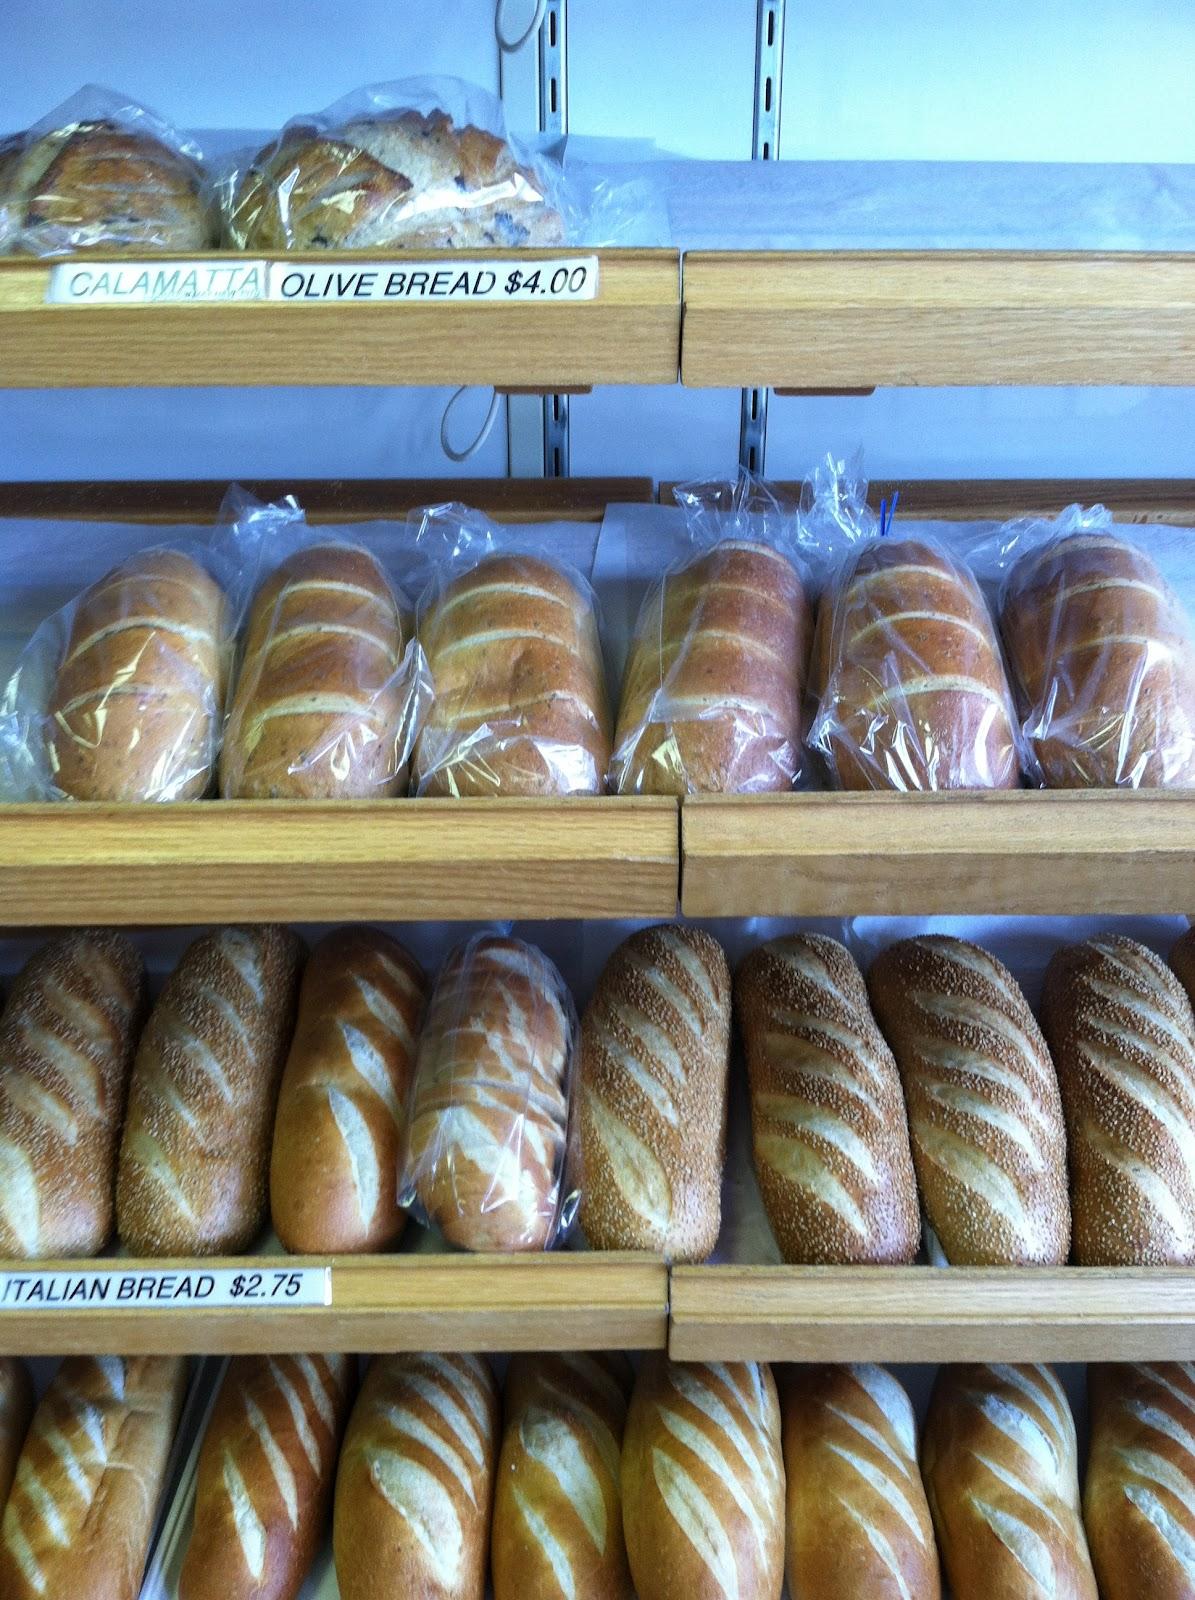 Larry S Bakery Cafe Peachtree City Ga Facebook